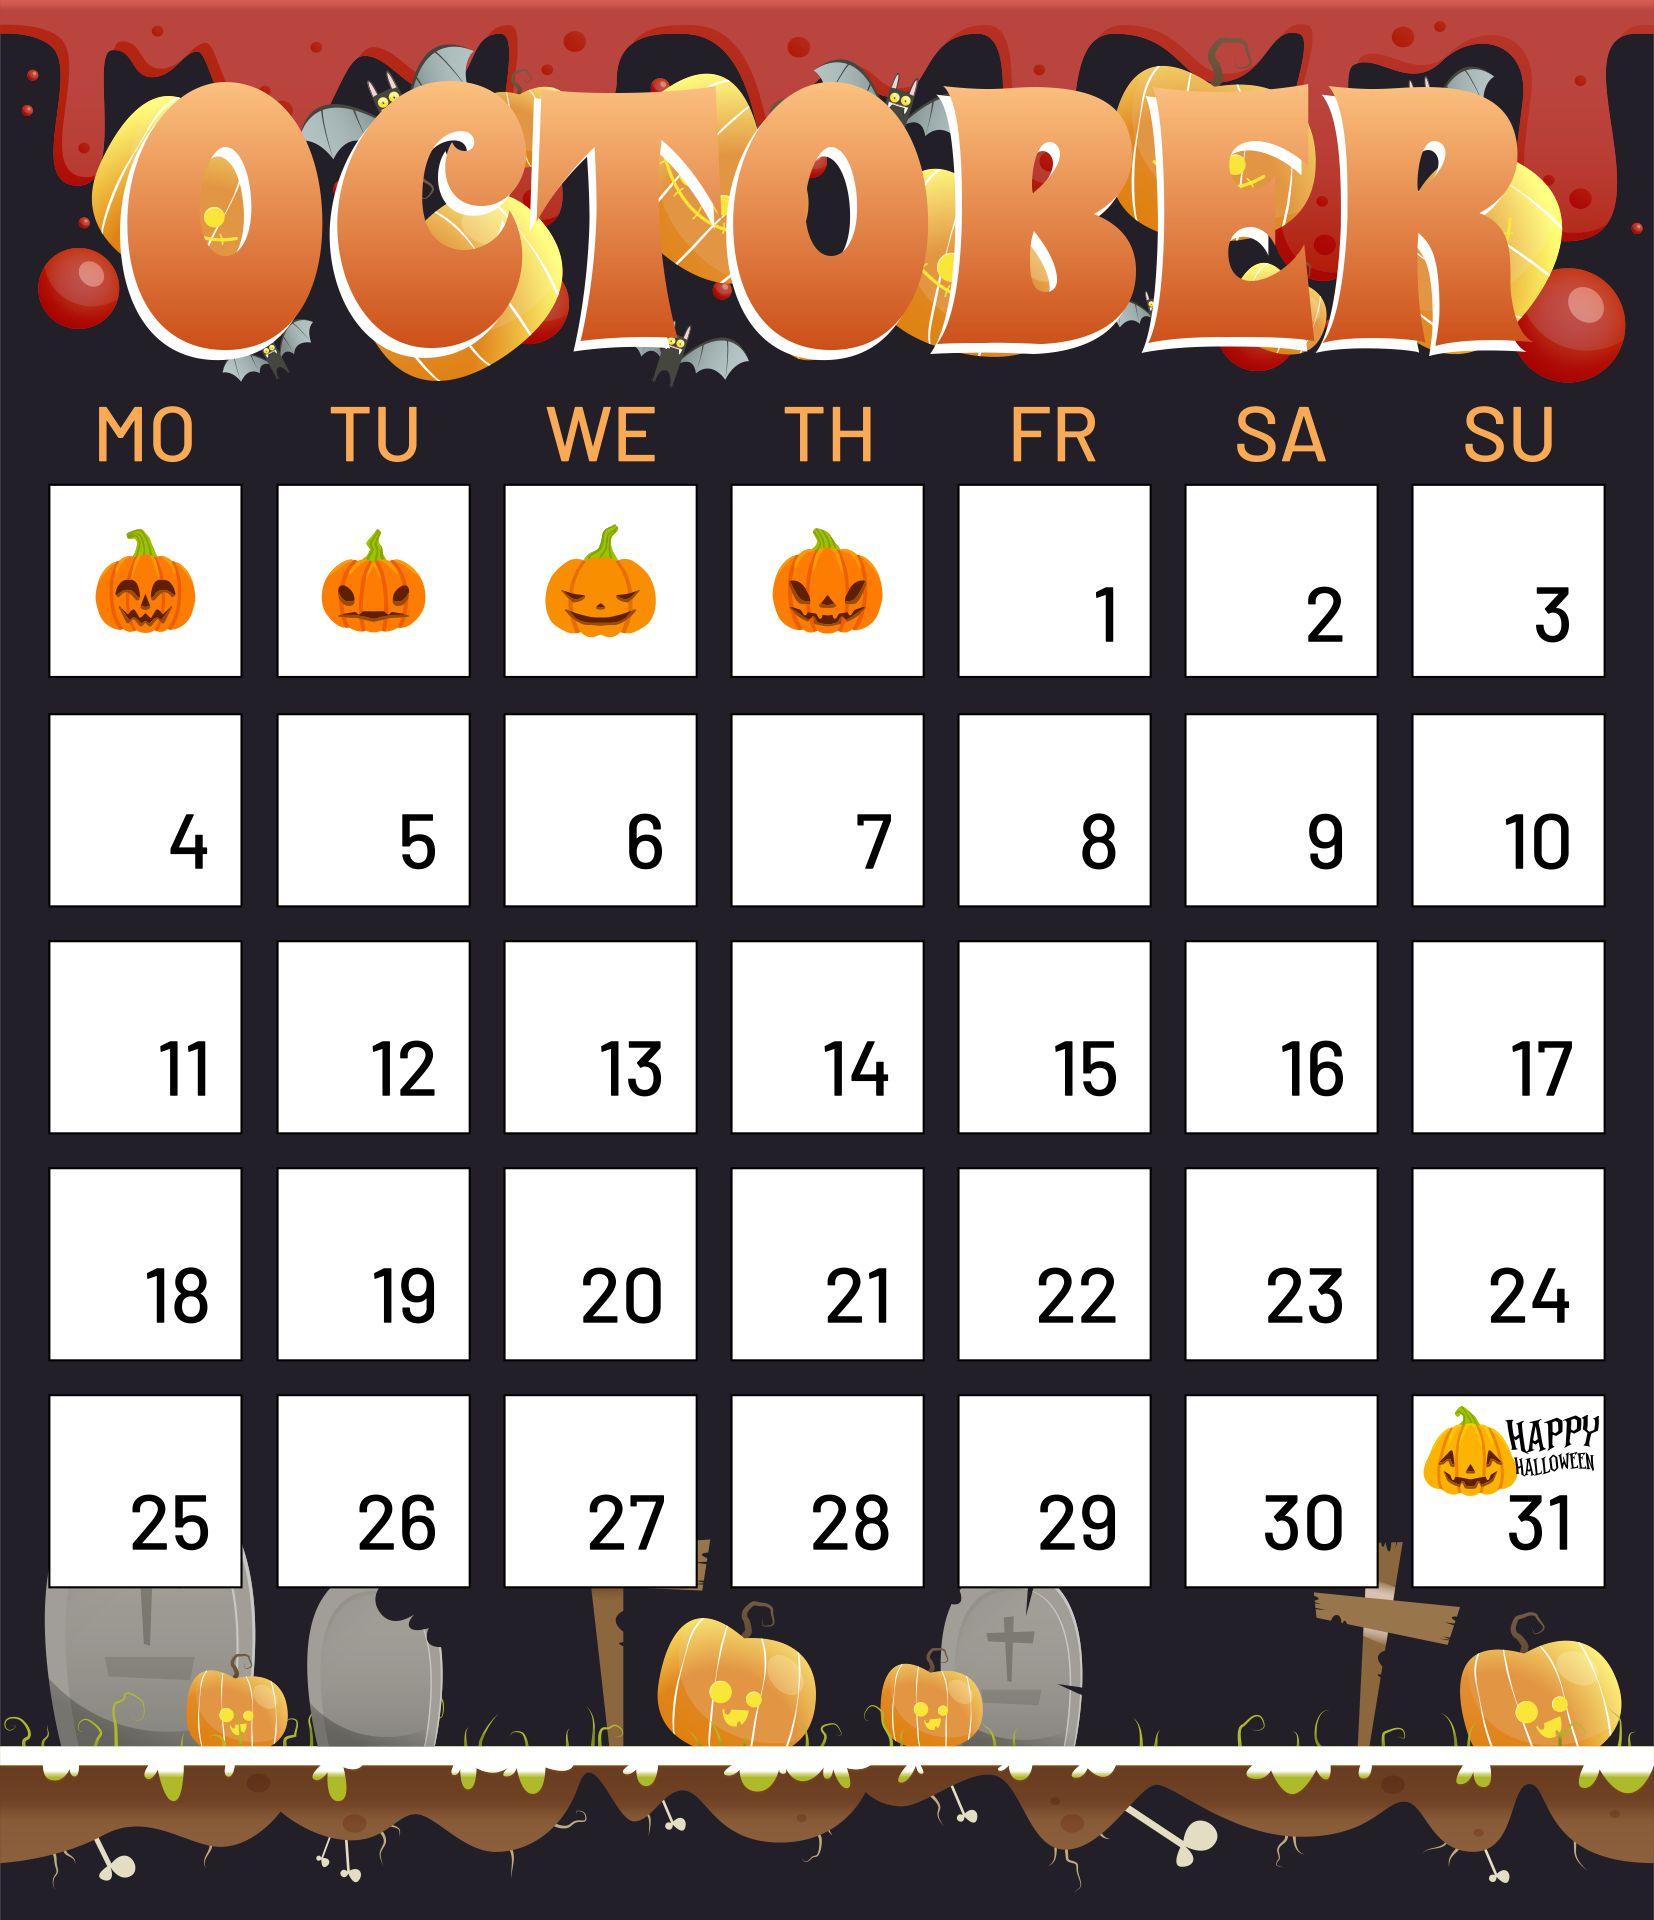 Free Printable Halloween October Calendars To Print With  Halloween Borders And Halloween Backgrounds